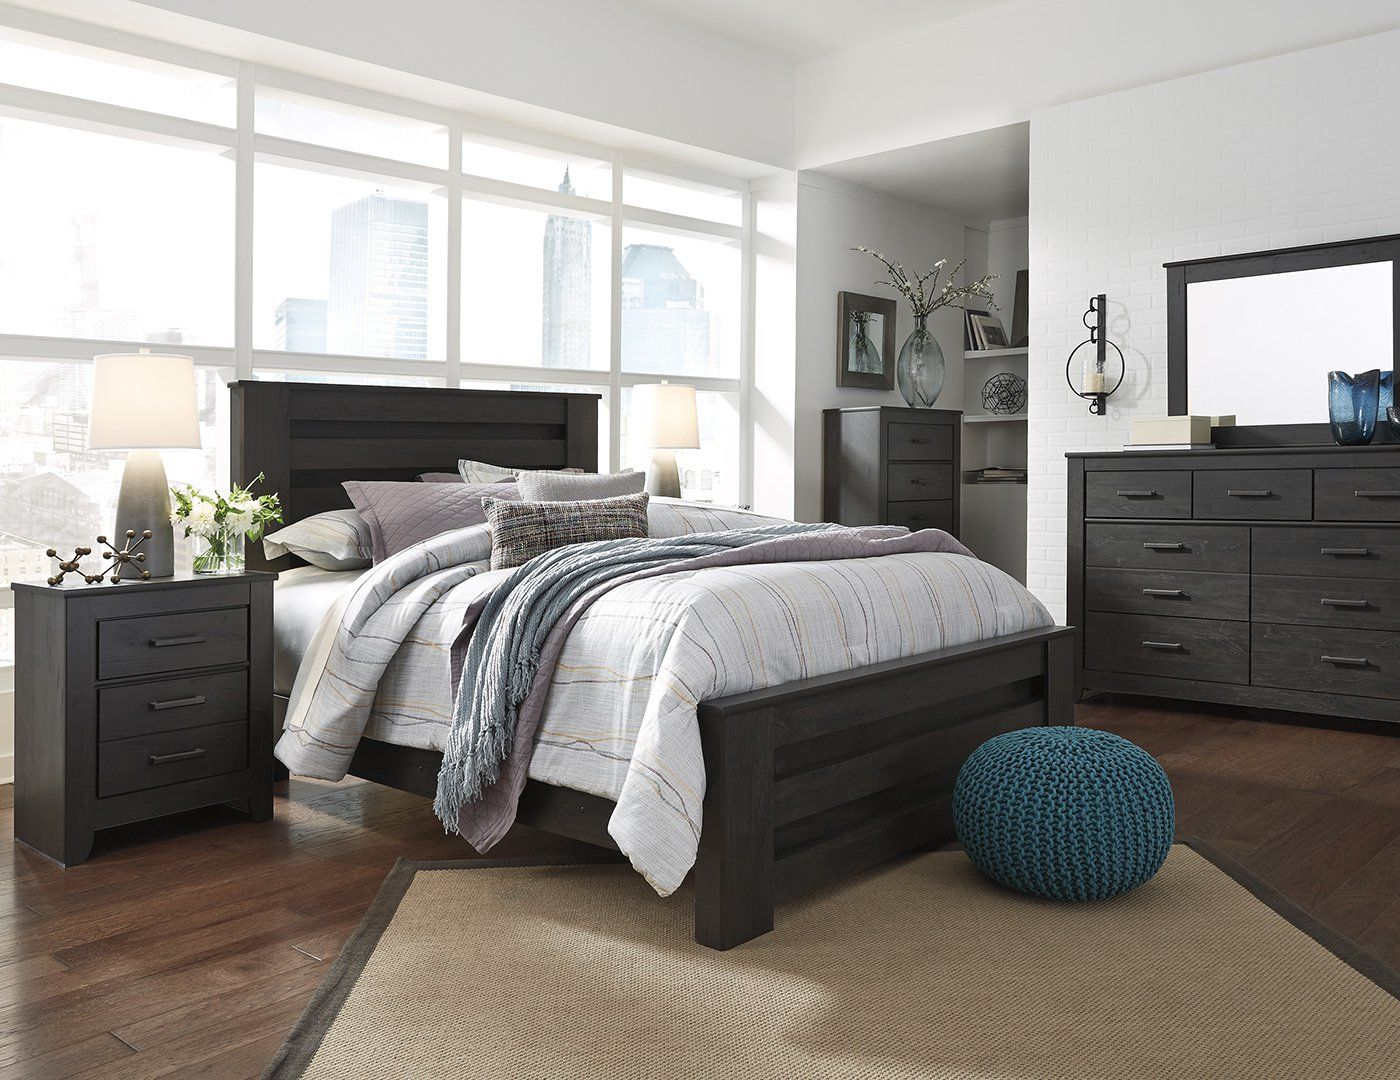 brinxton 5 pc king bedroom set king poster bed dresser mirror